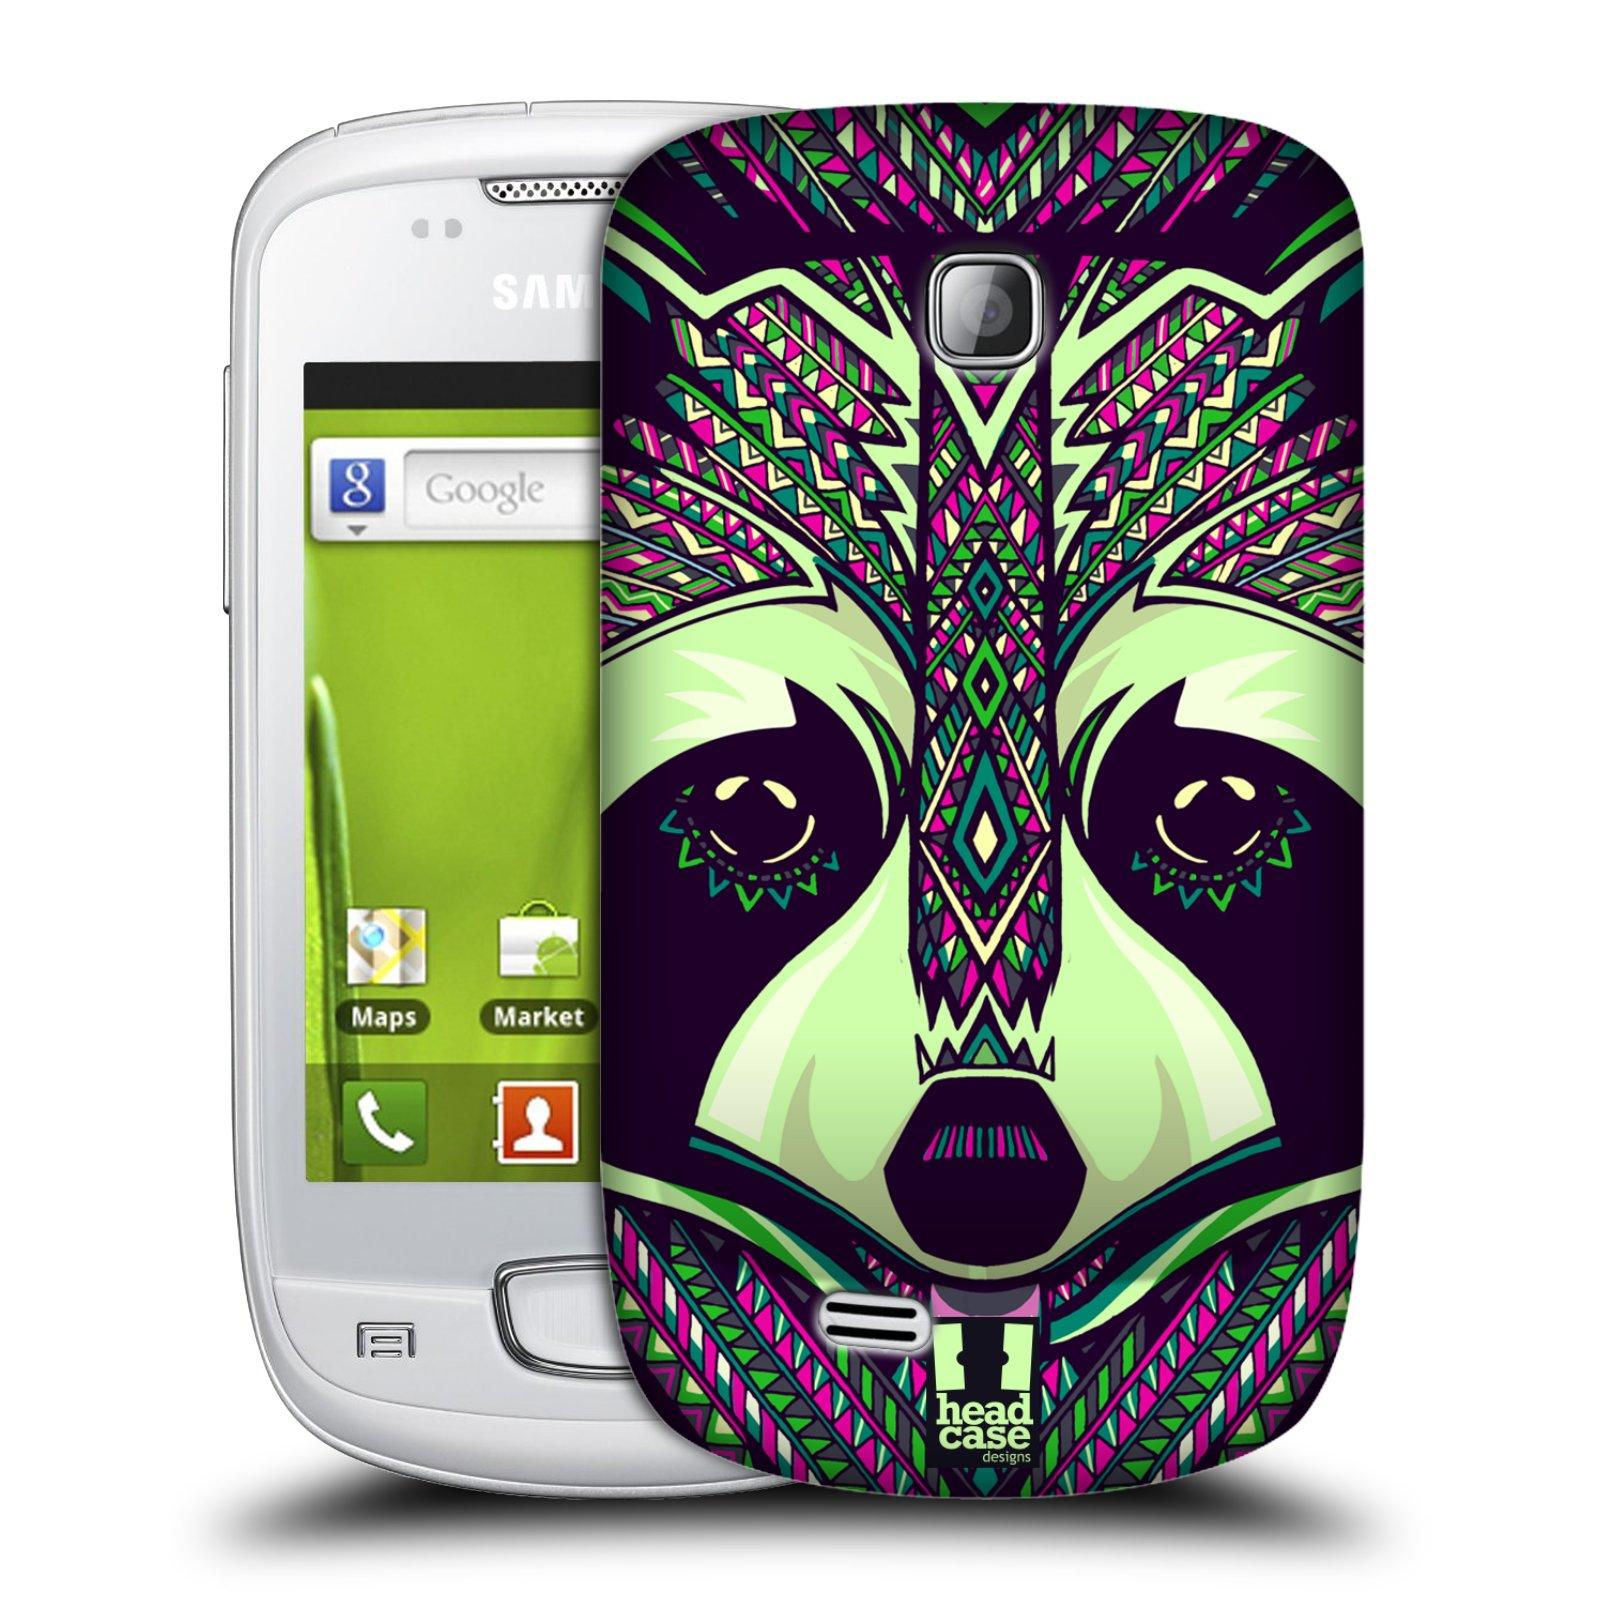 Plastové pouzdro na mobil Samsung Galaxy Mini HEAD CASE AZTEC MÝVAL (Kryt či obal na mobilní telefon Samsung Galaxy Mini GT-S5570 / GT-S5570i)